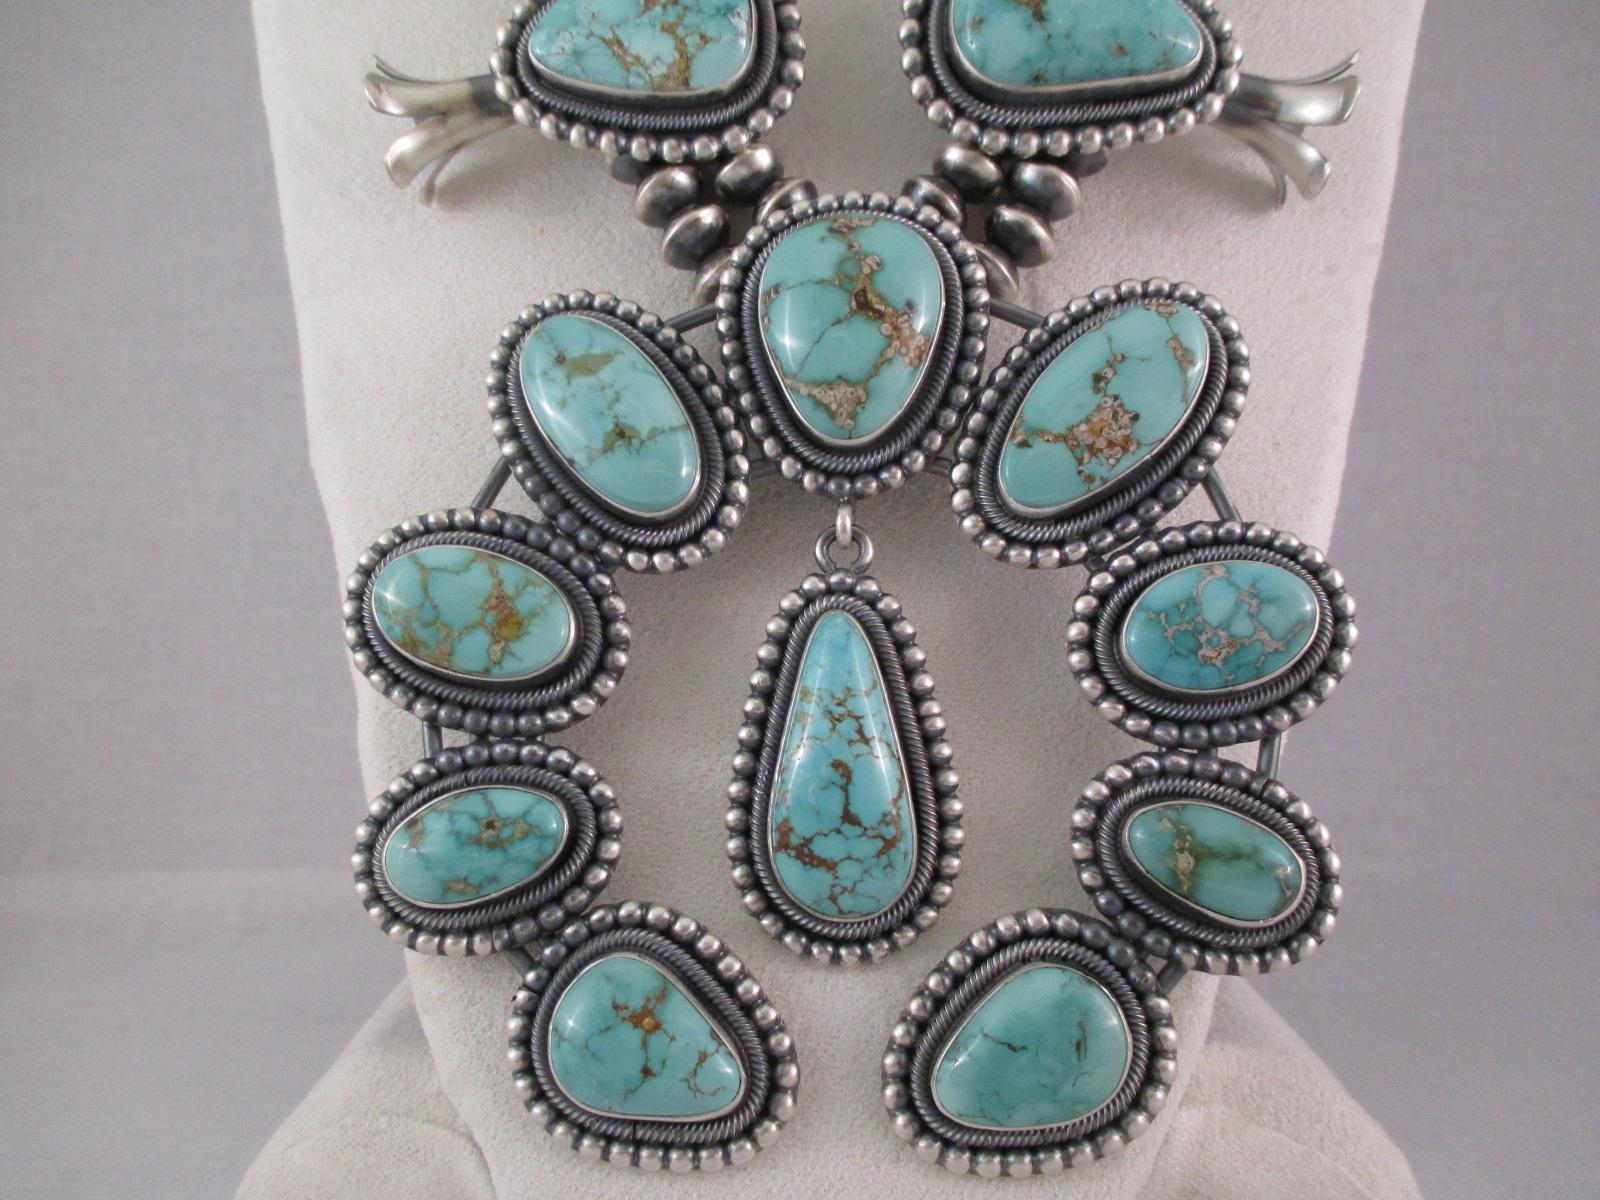 History of navajo jewelry jewelinfo4u gemstones and jewellery history of navajo jewelry jewelinfo4u gemstones and jewellery information portal buycottarizona Images